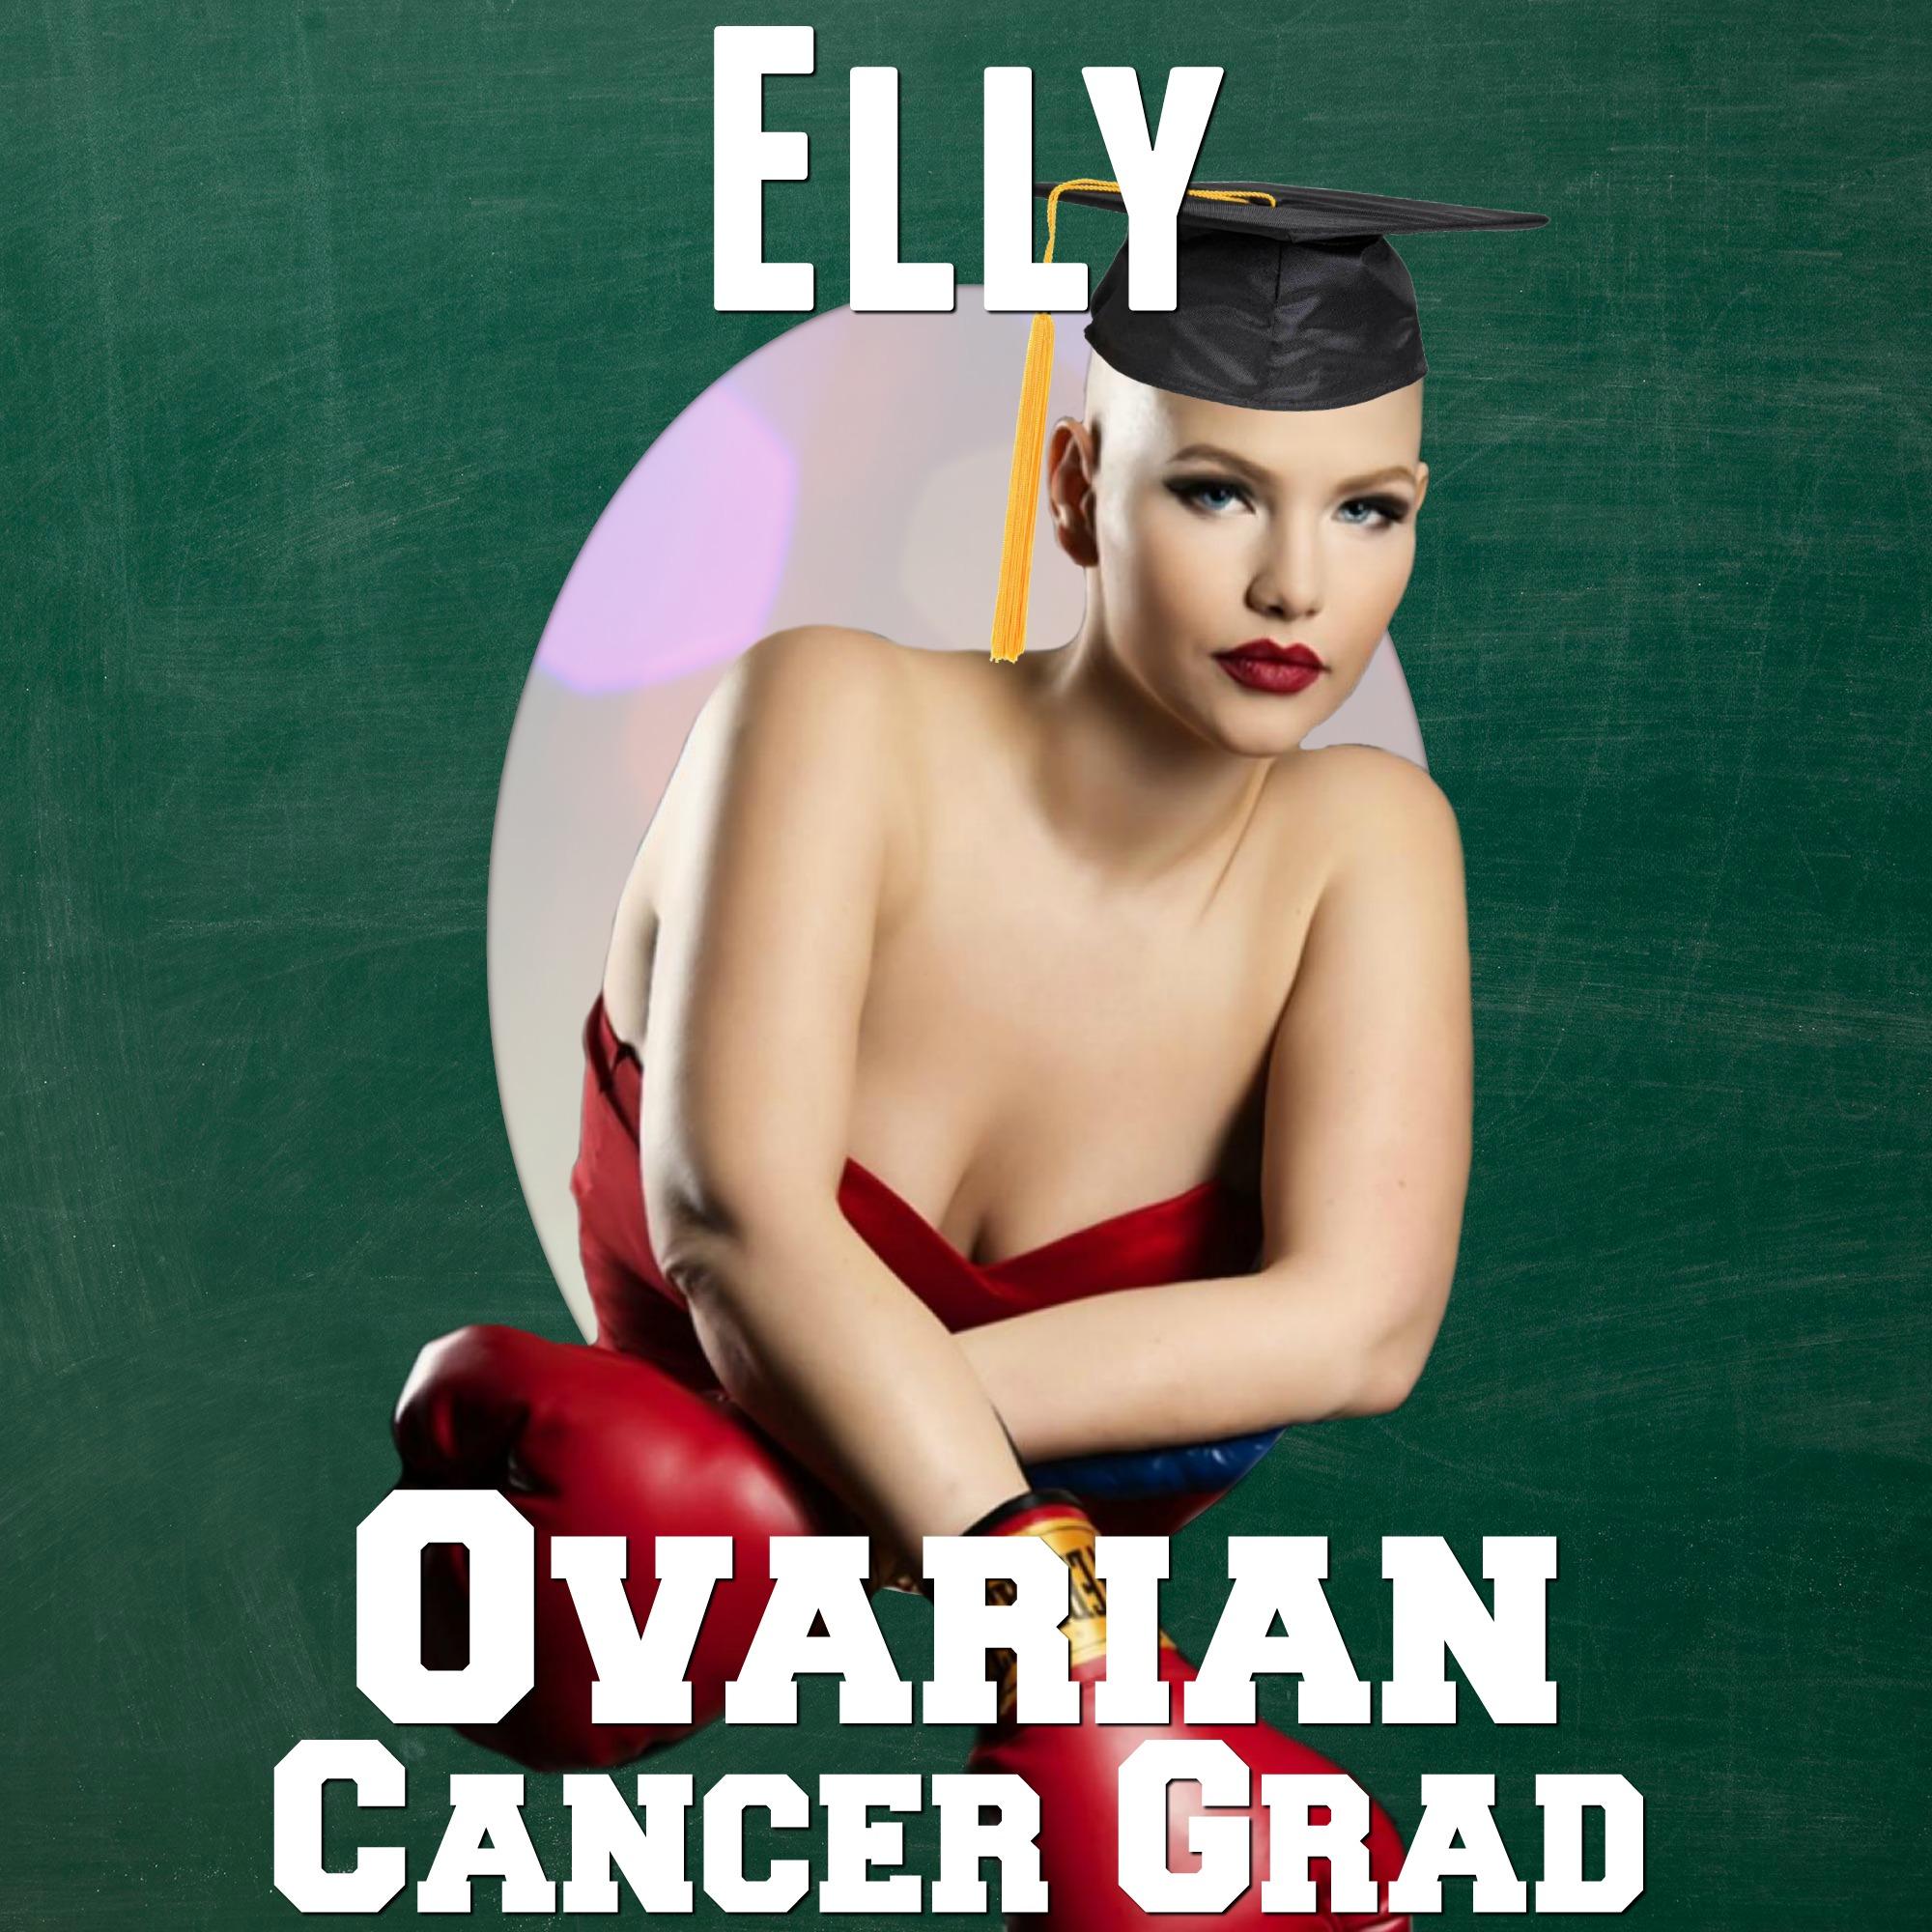 Elly mayday grad photo cancer grad yearbook